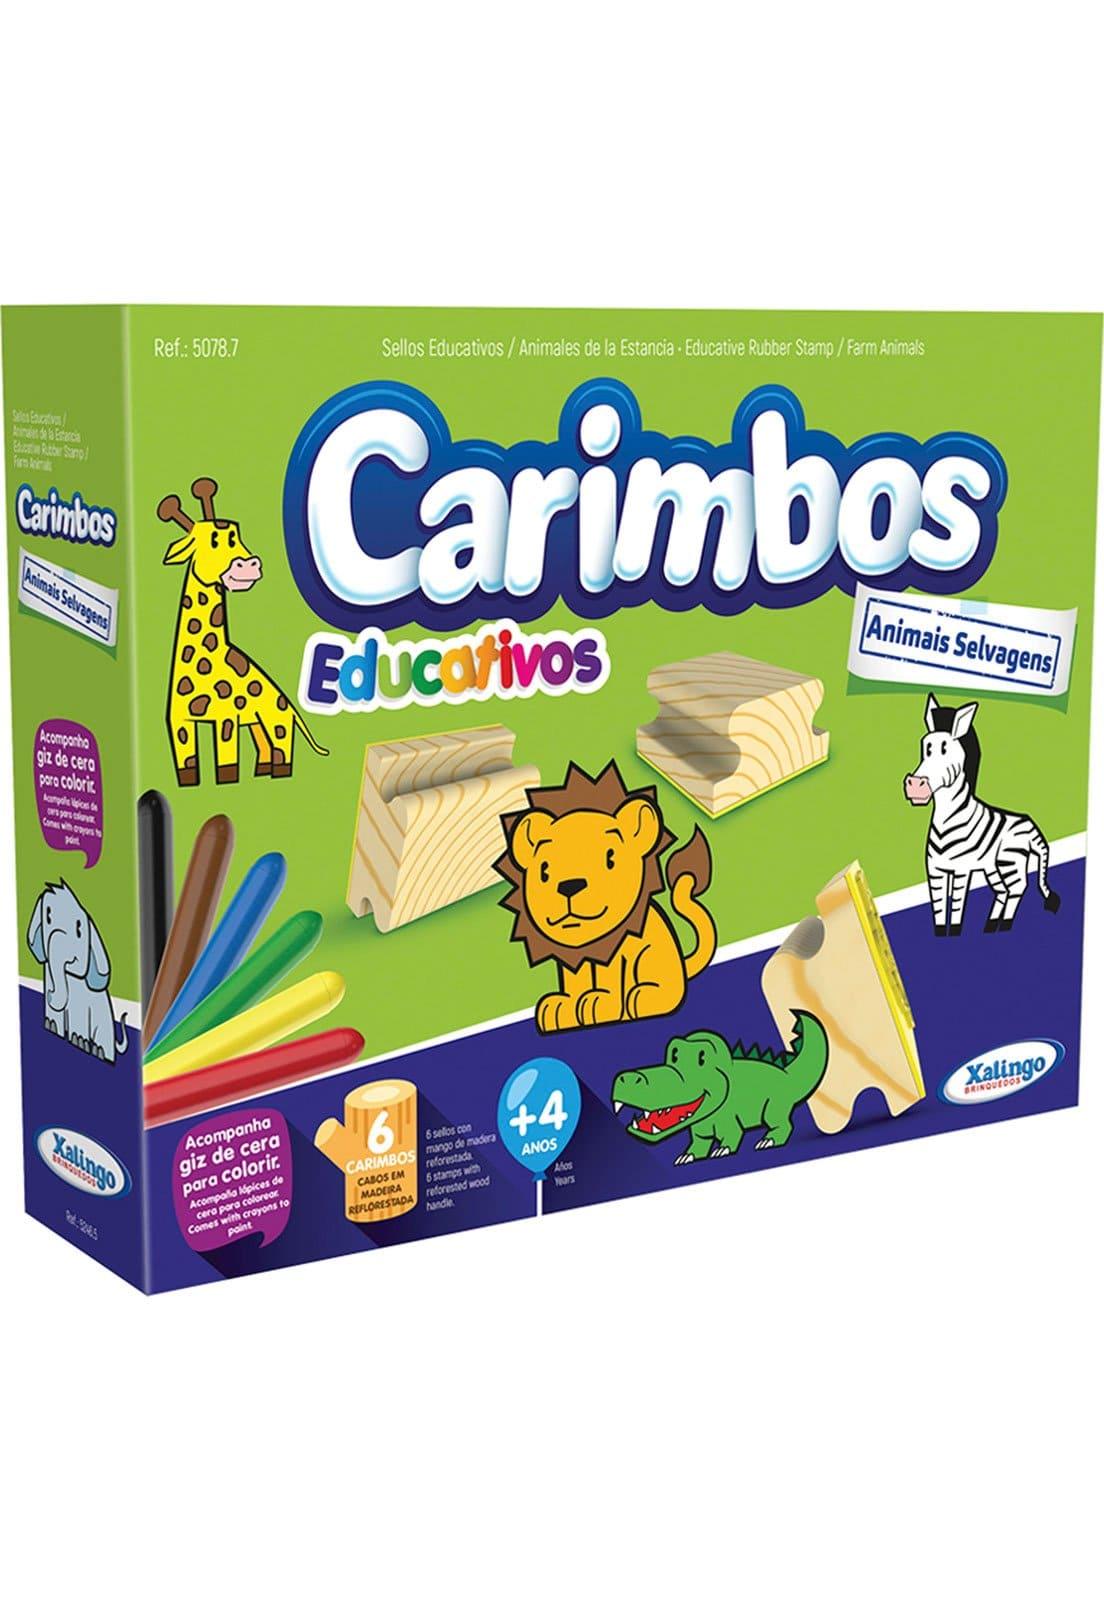 Brinquedo Carimbos Educativos Animais Selvagens Xalingo